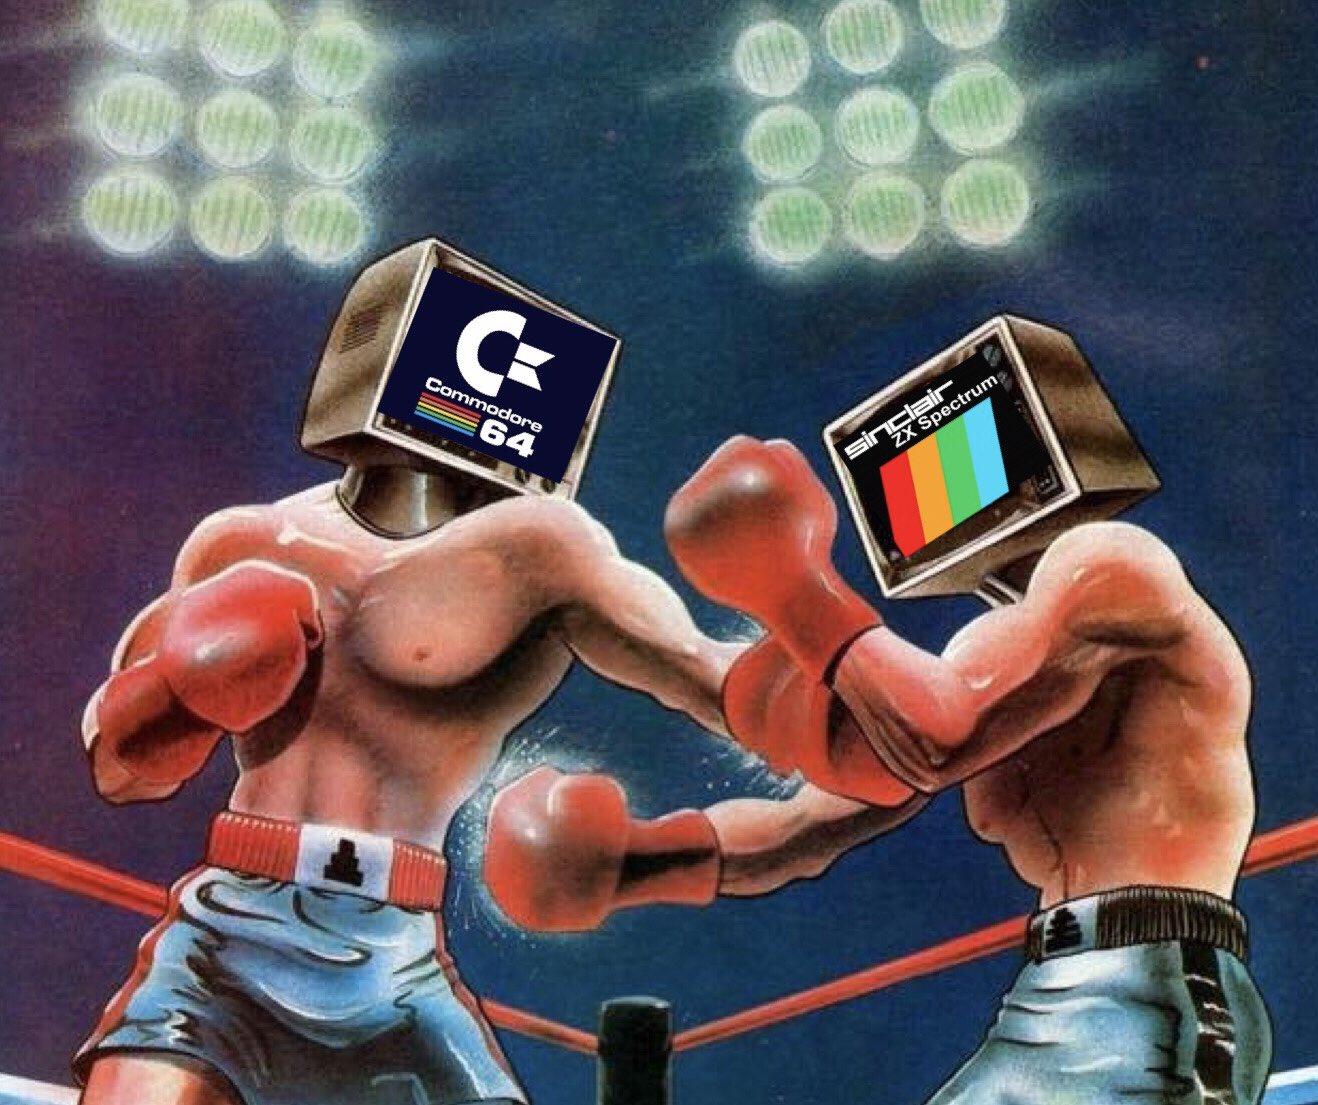 C64 vs ZX